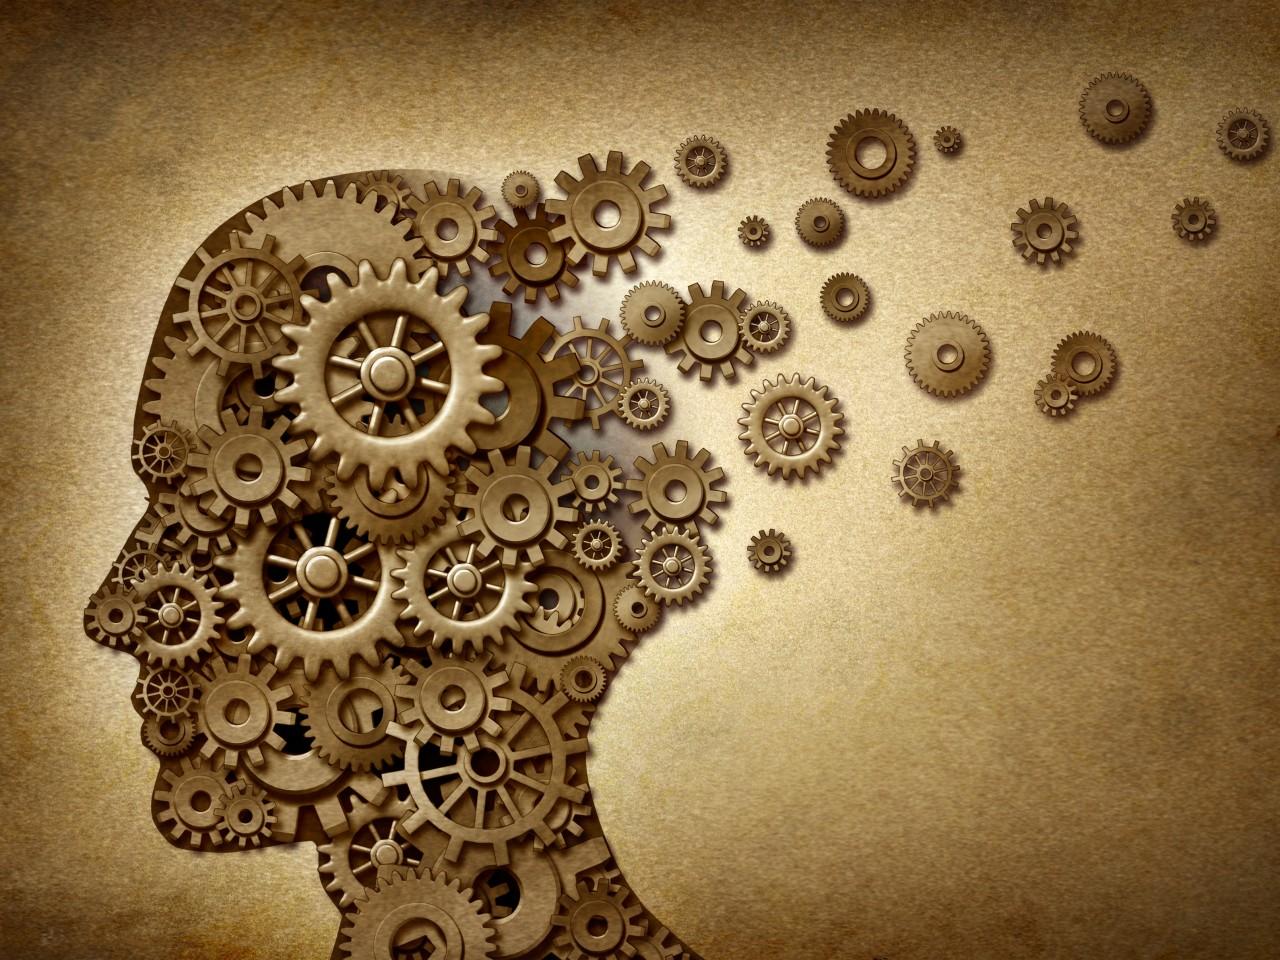 psychology-brain-wheels-1280x960